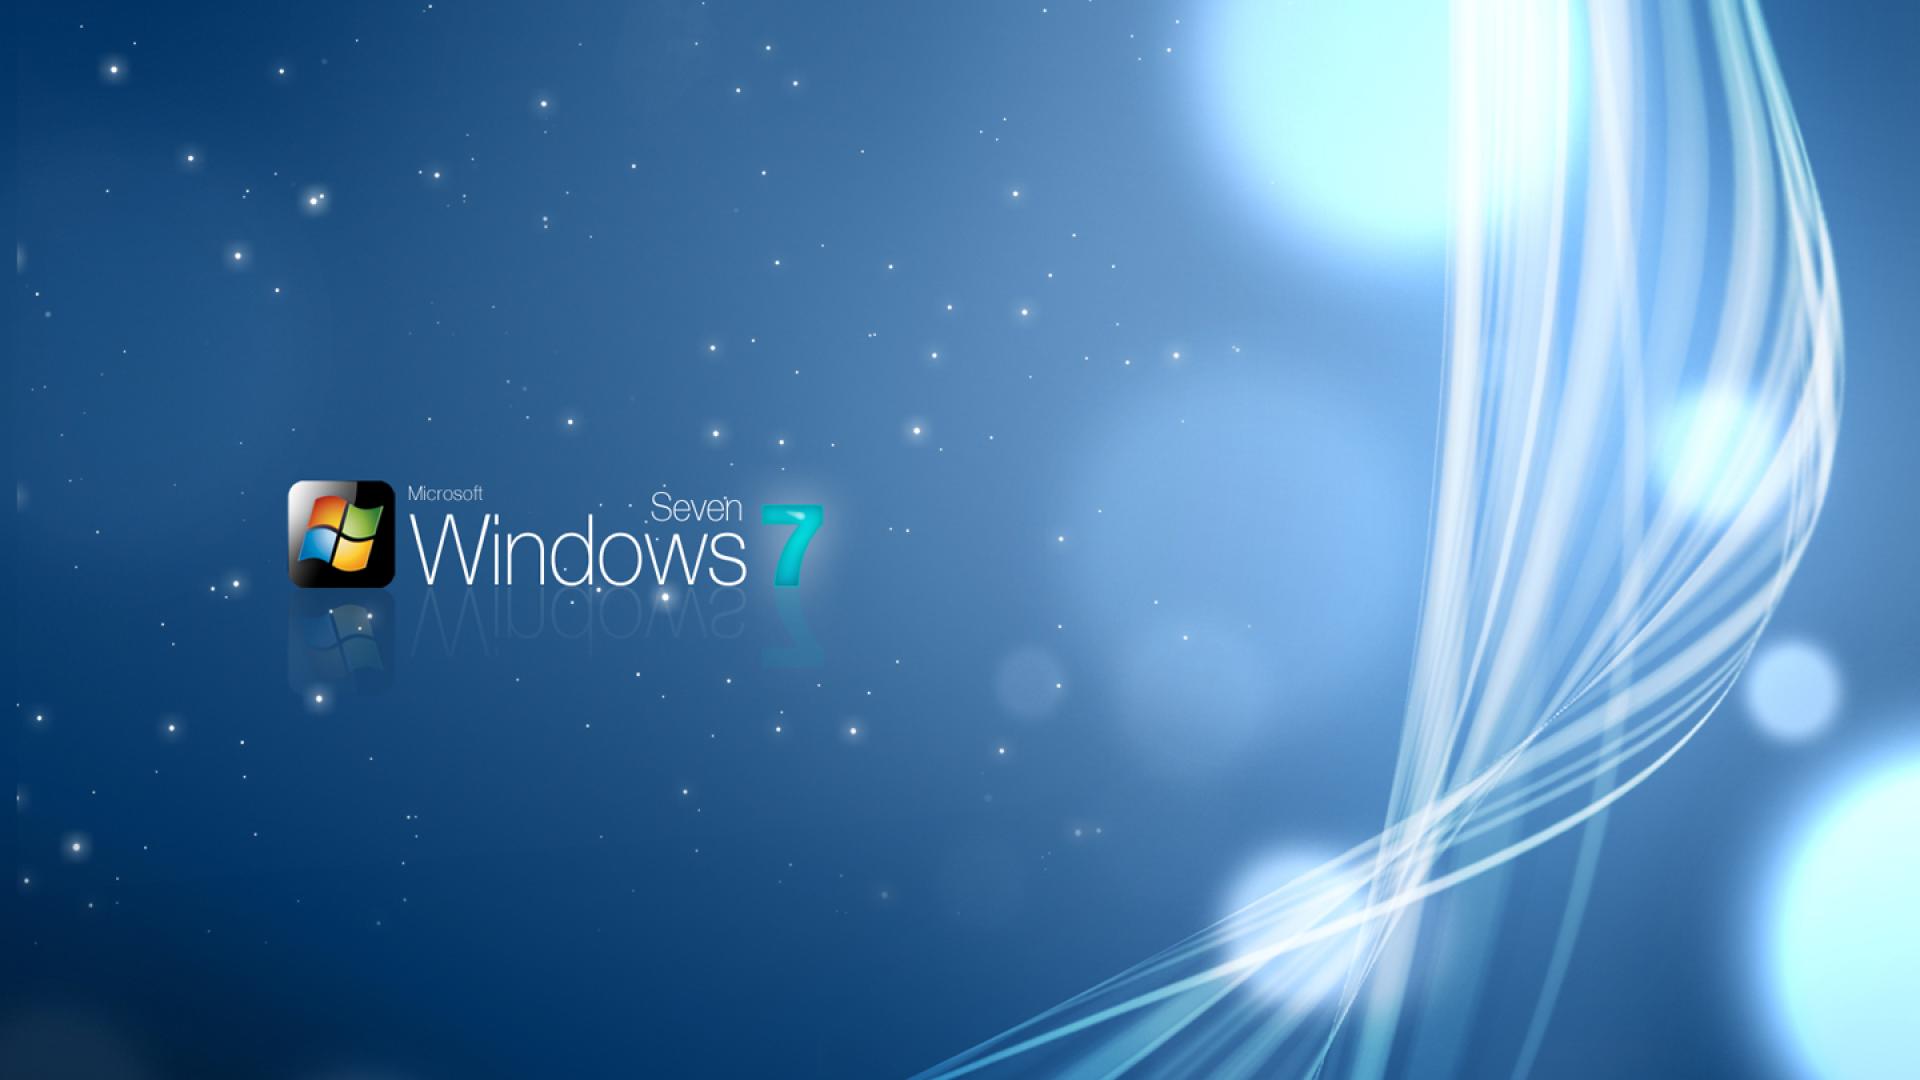 Windows 7 Sparkly Wallpaper